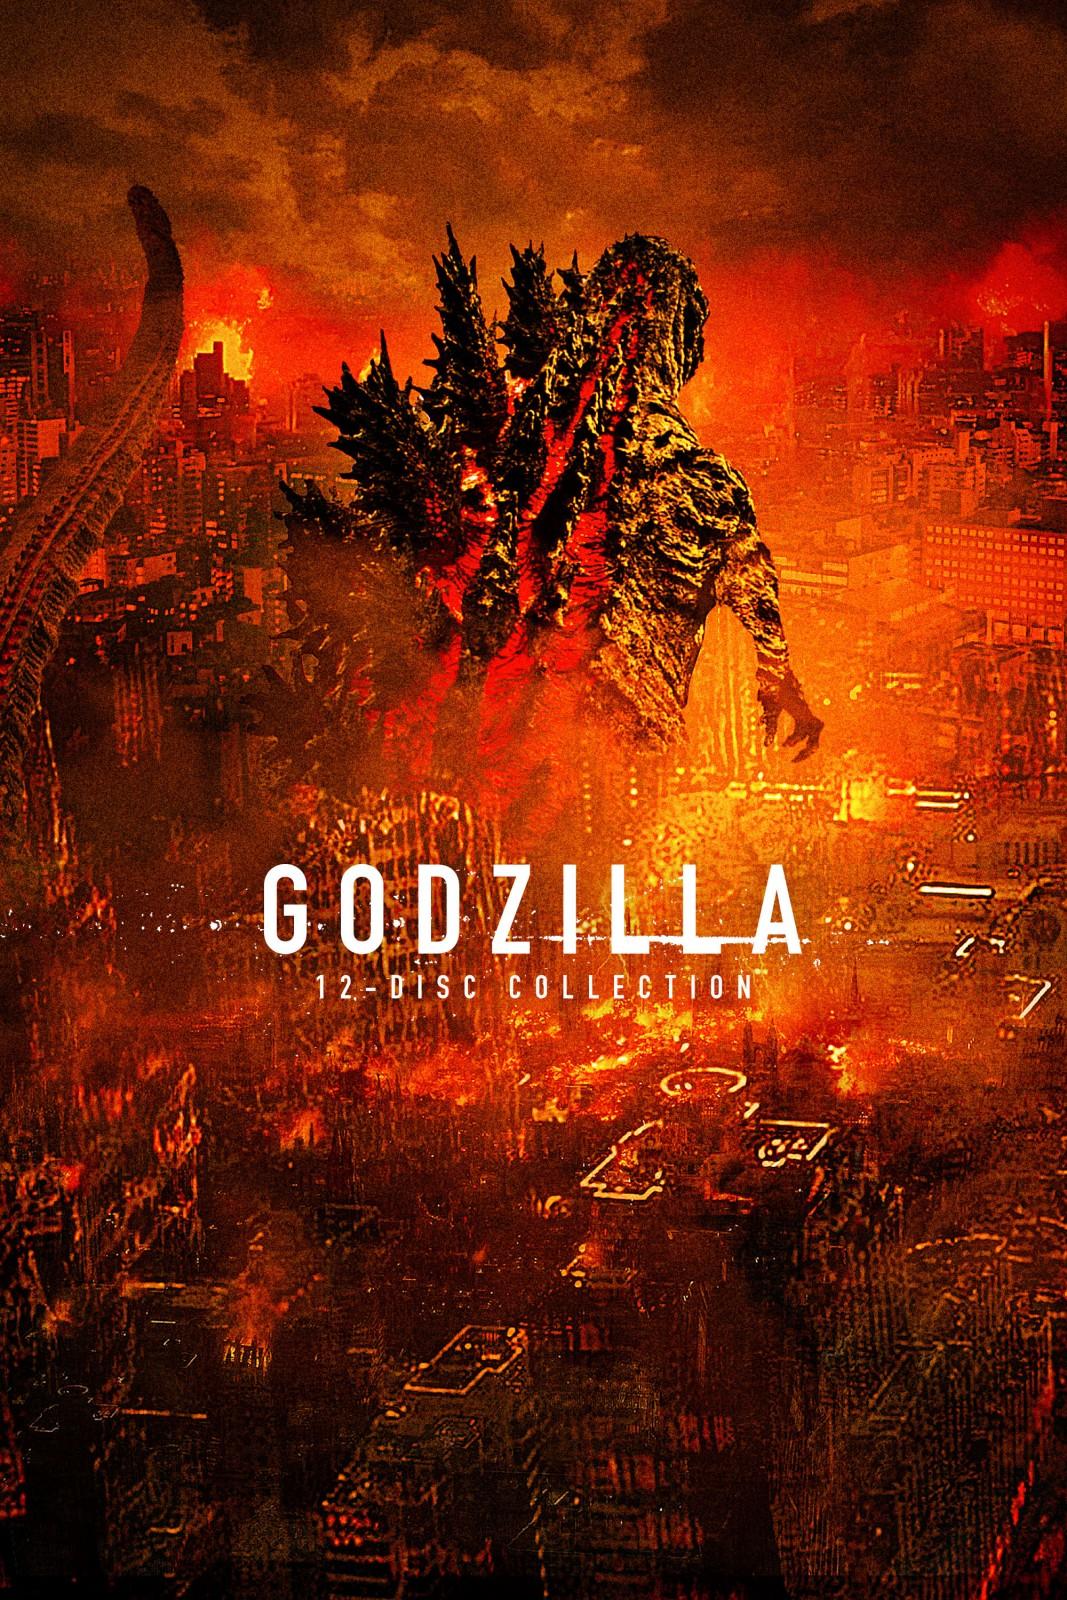 Godzilla Filme Anschauen